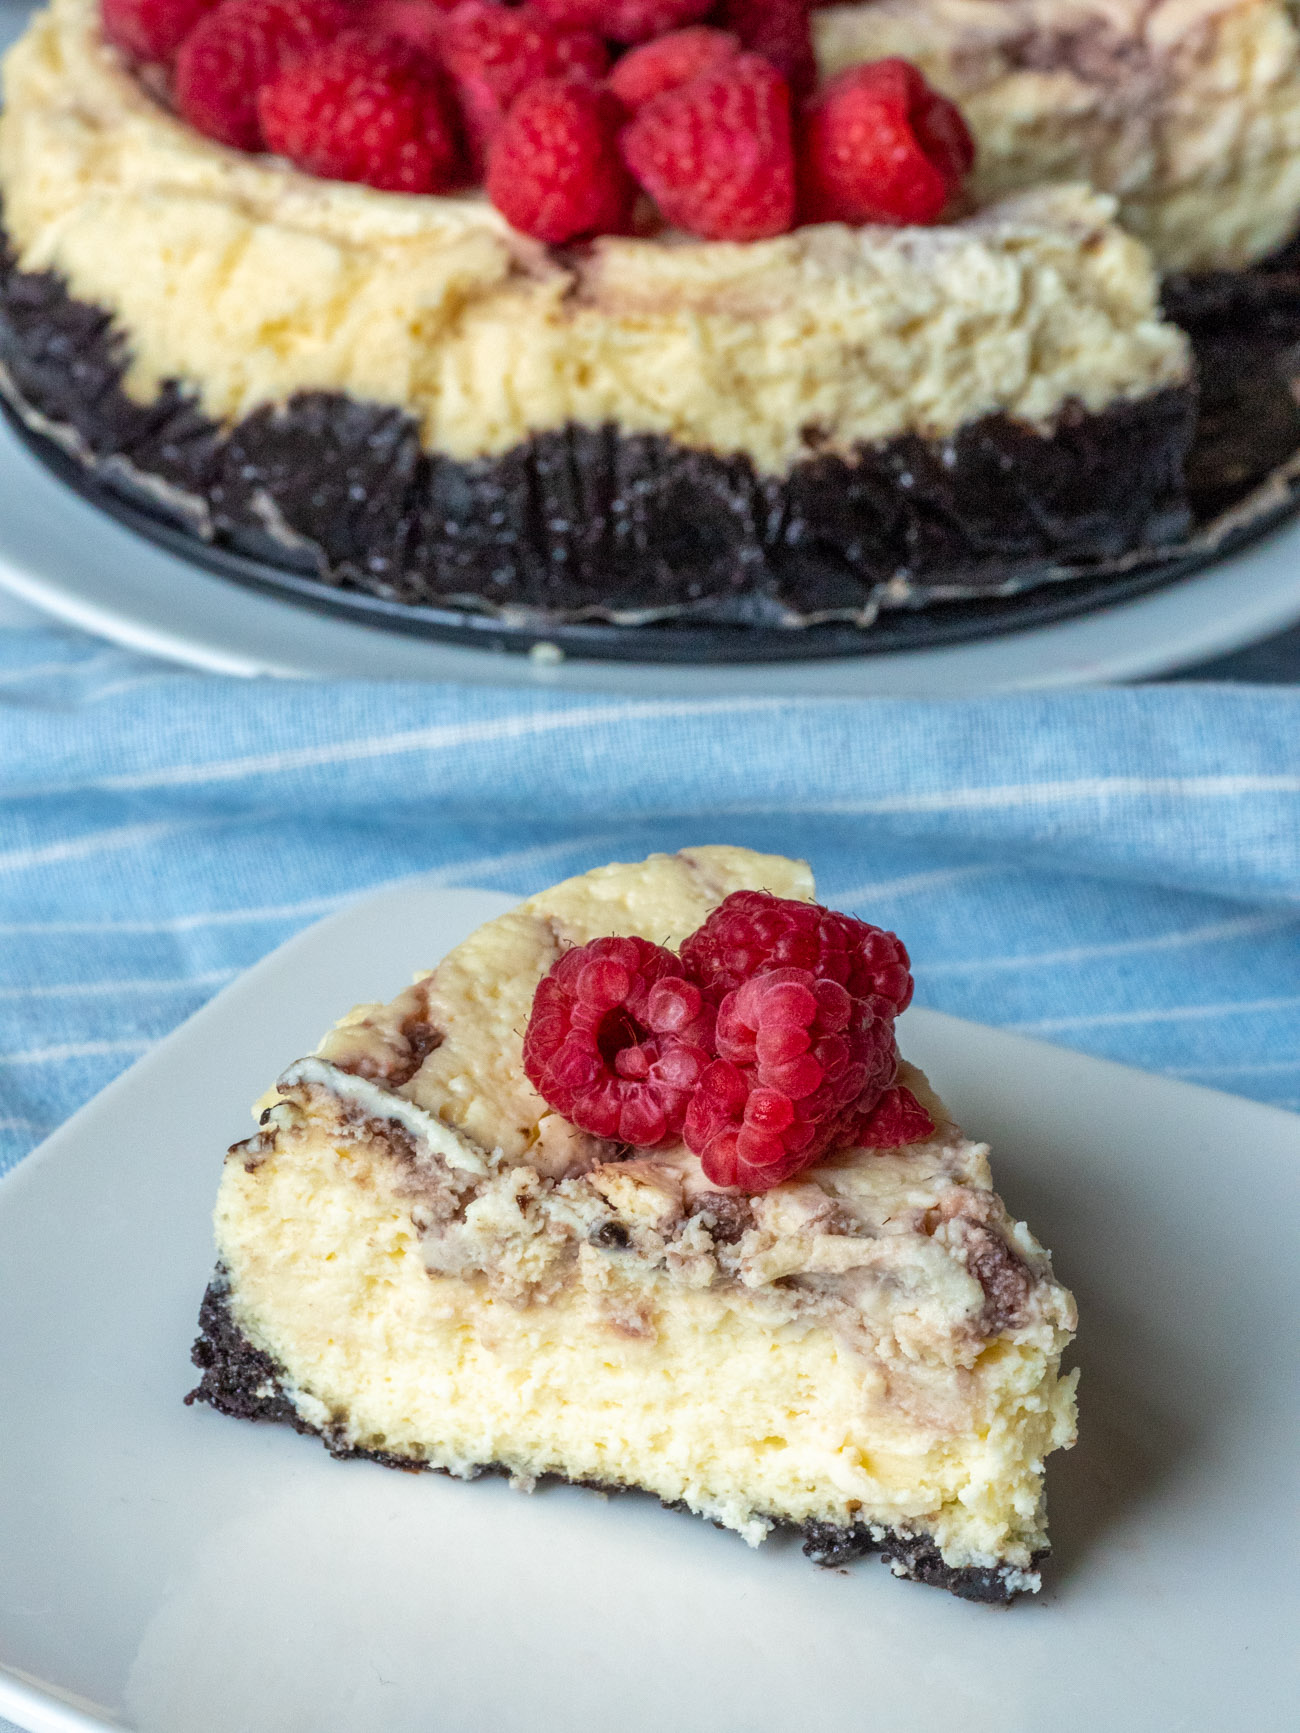 Slow Cooker Chocolate Raspberry Cheesecake